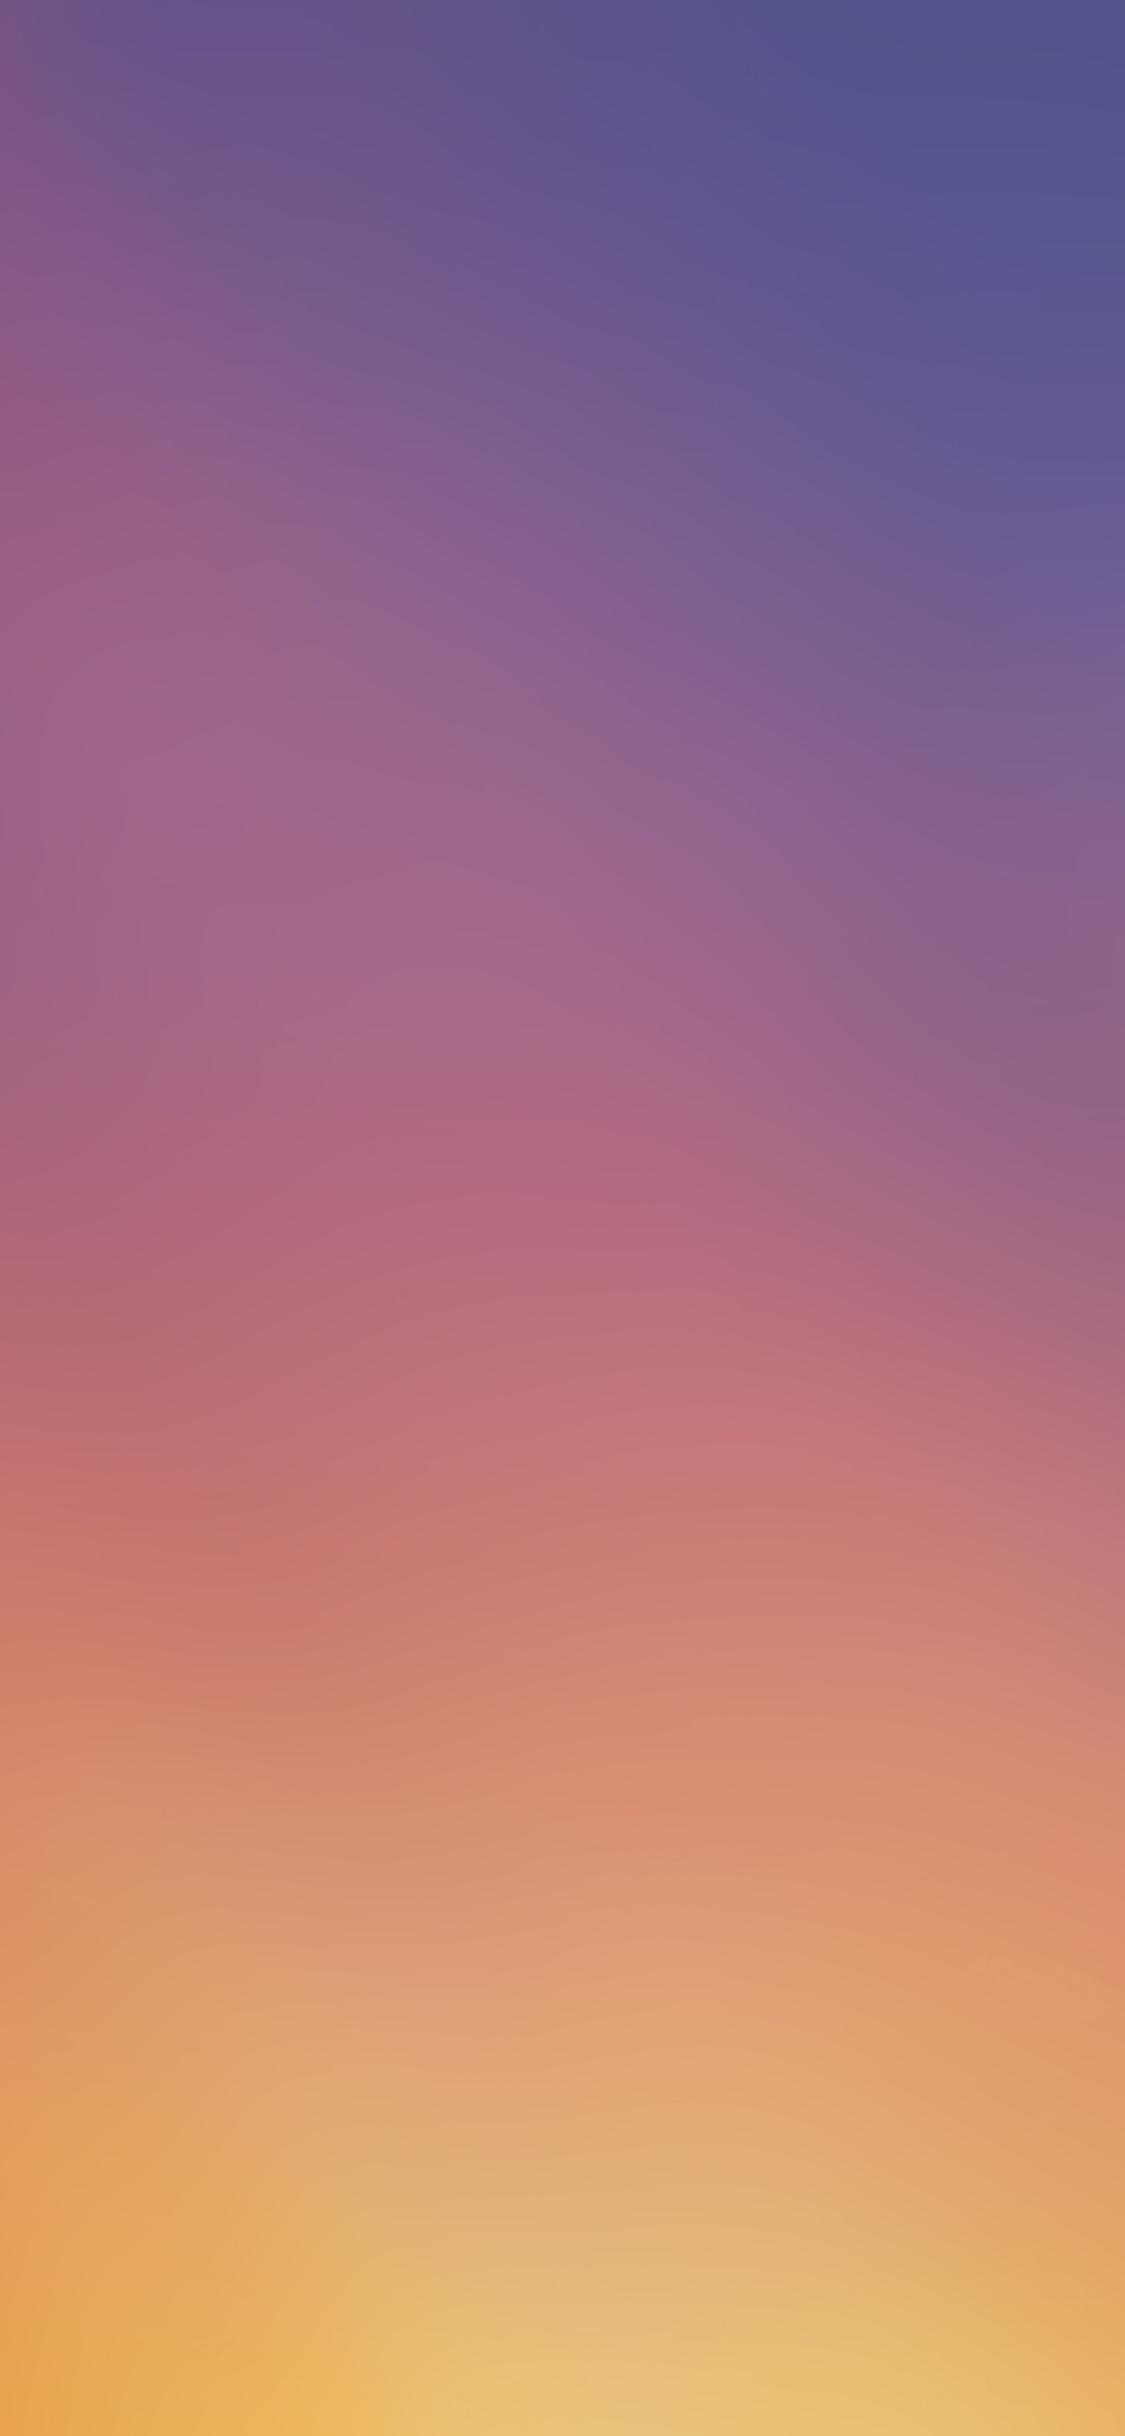 iPhoneXpapers.com-Apple-iPhone-wallpaper-sd62-fire-spark-morrning-light-gradation-blur